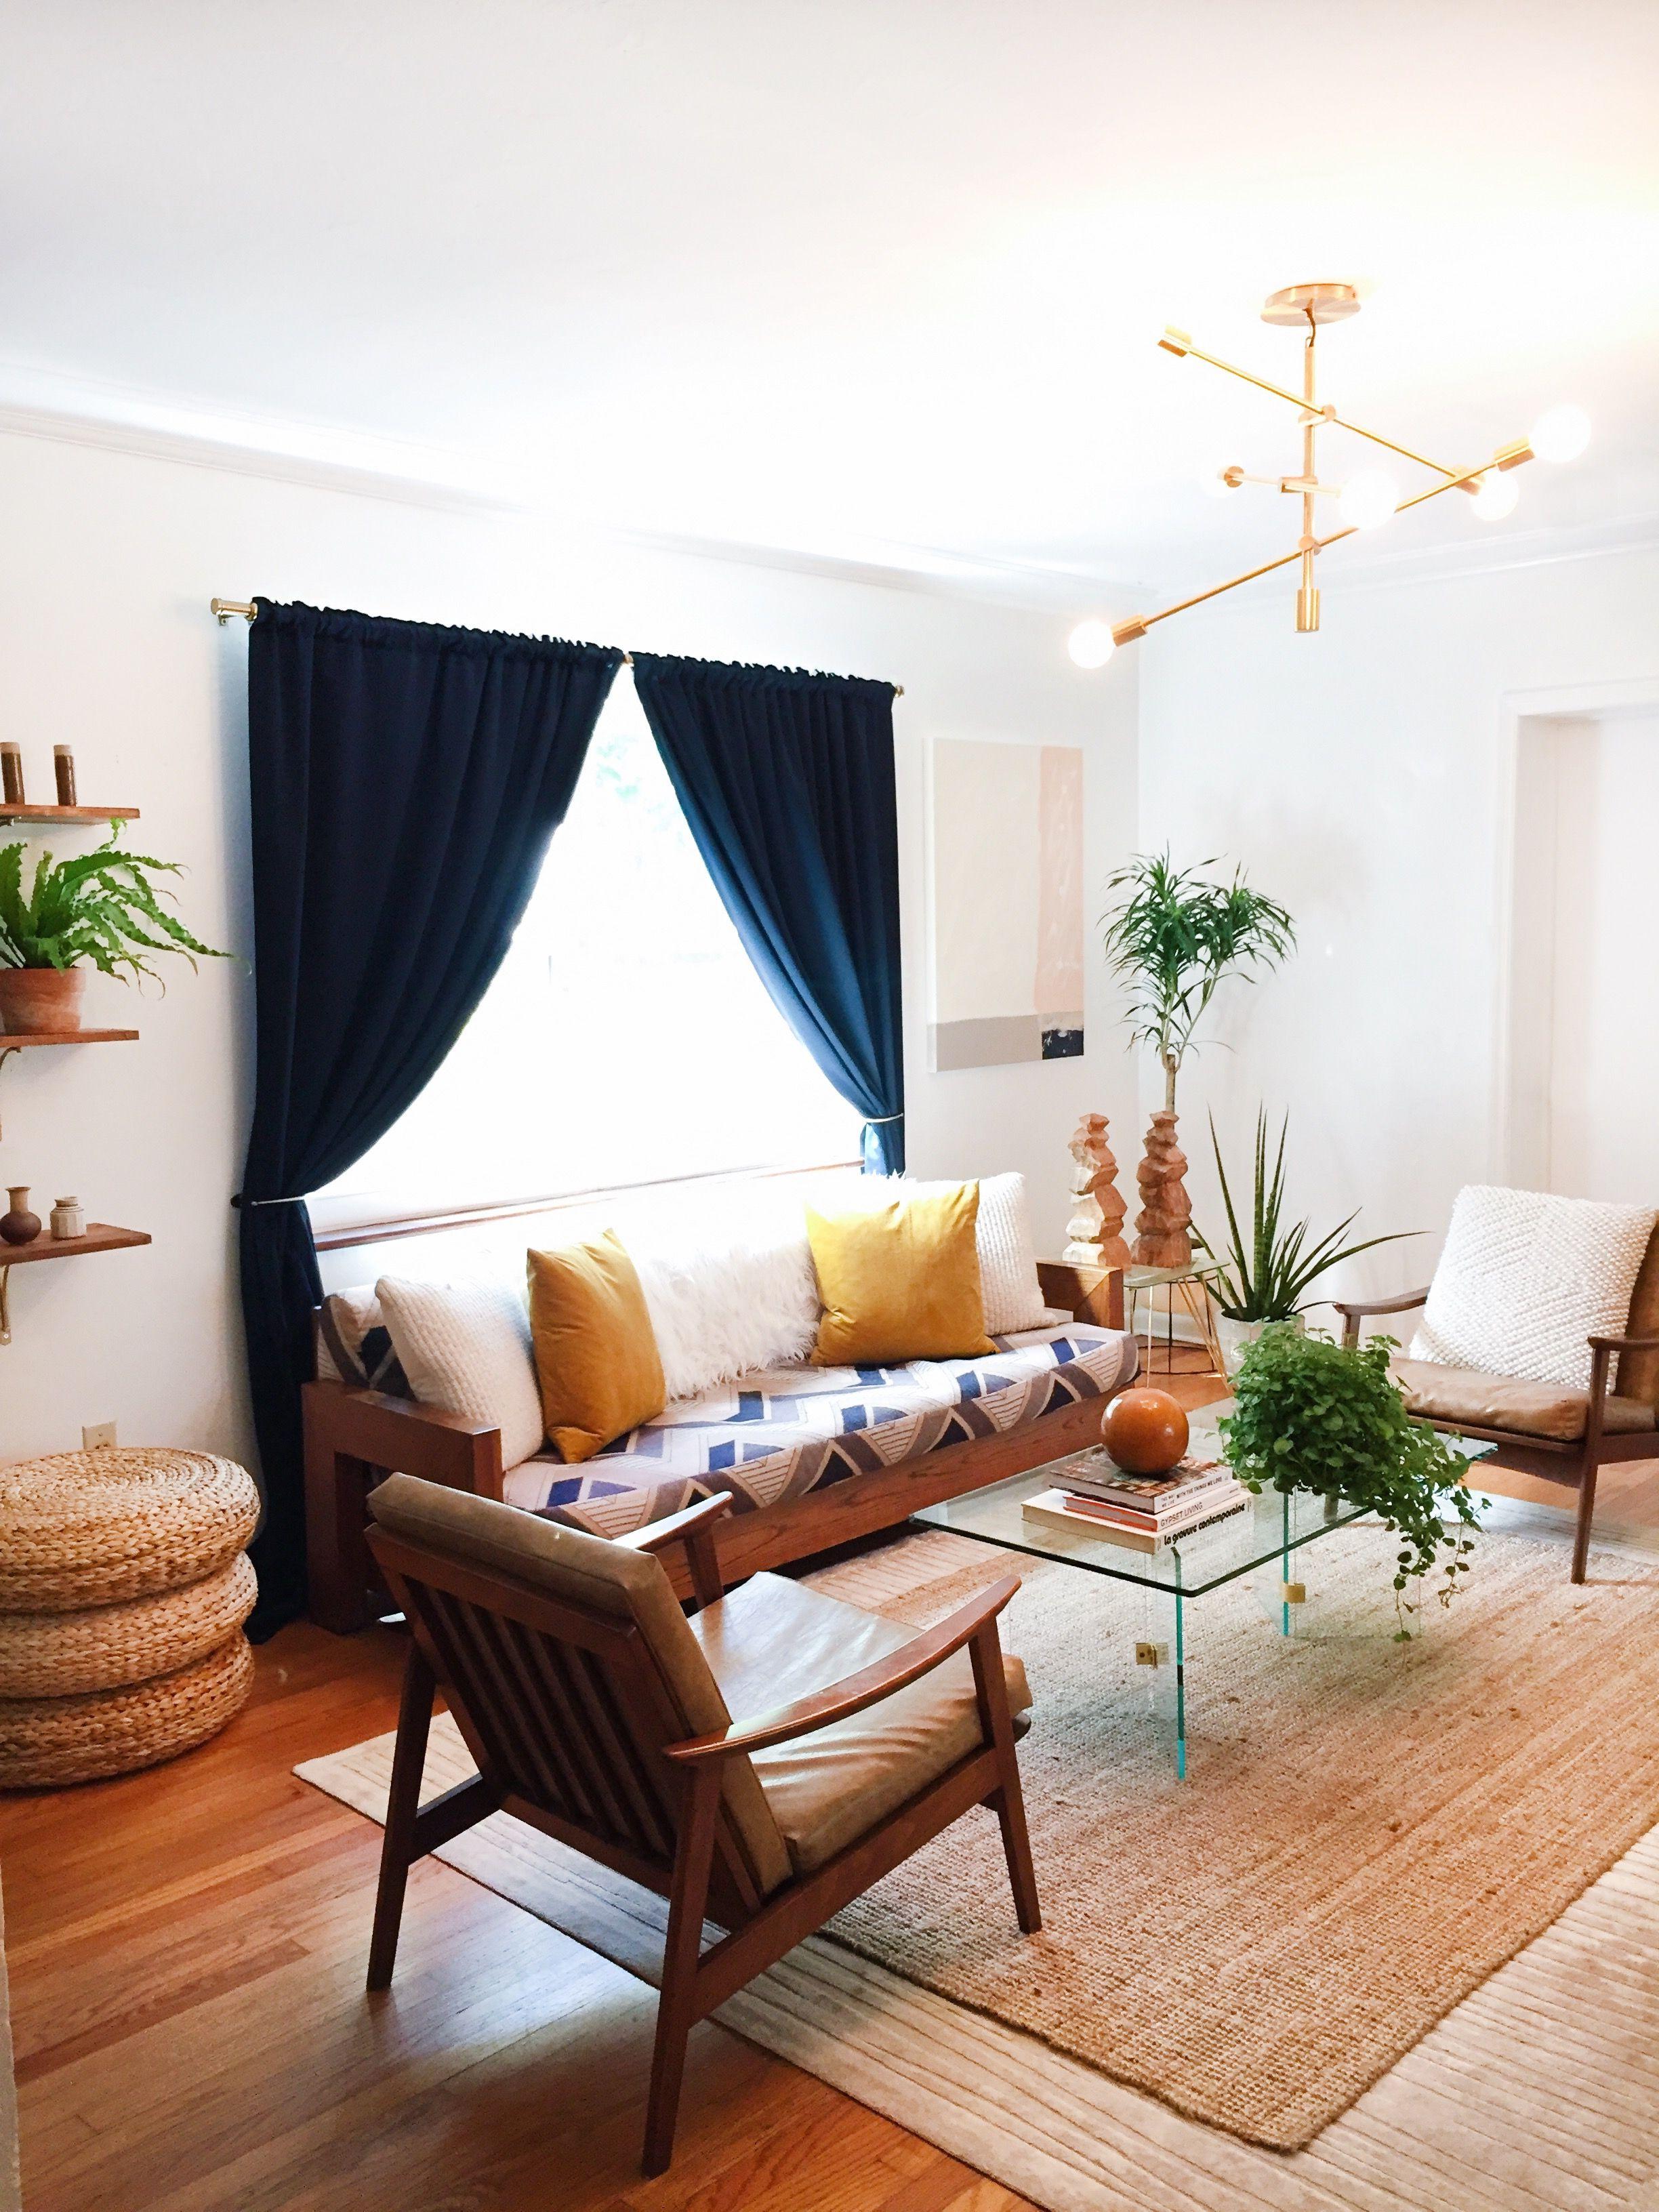 Www ArteBoheme Miami Based Interior Design Blog Mid Century Boho Living Room